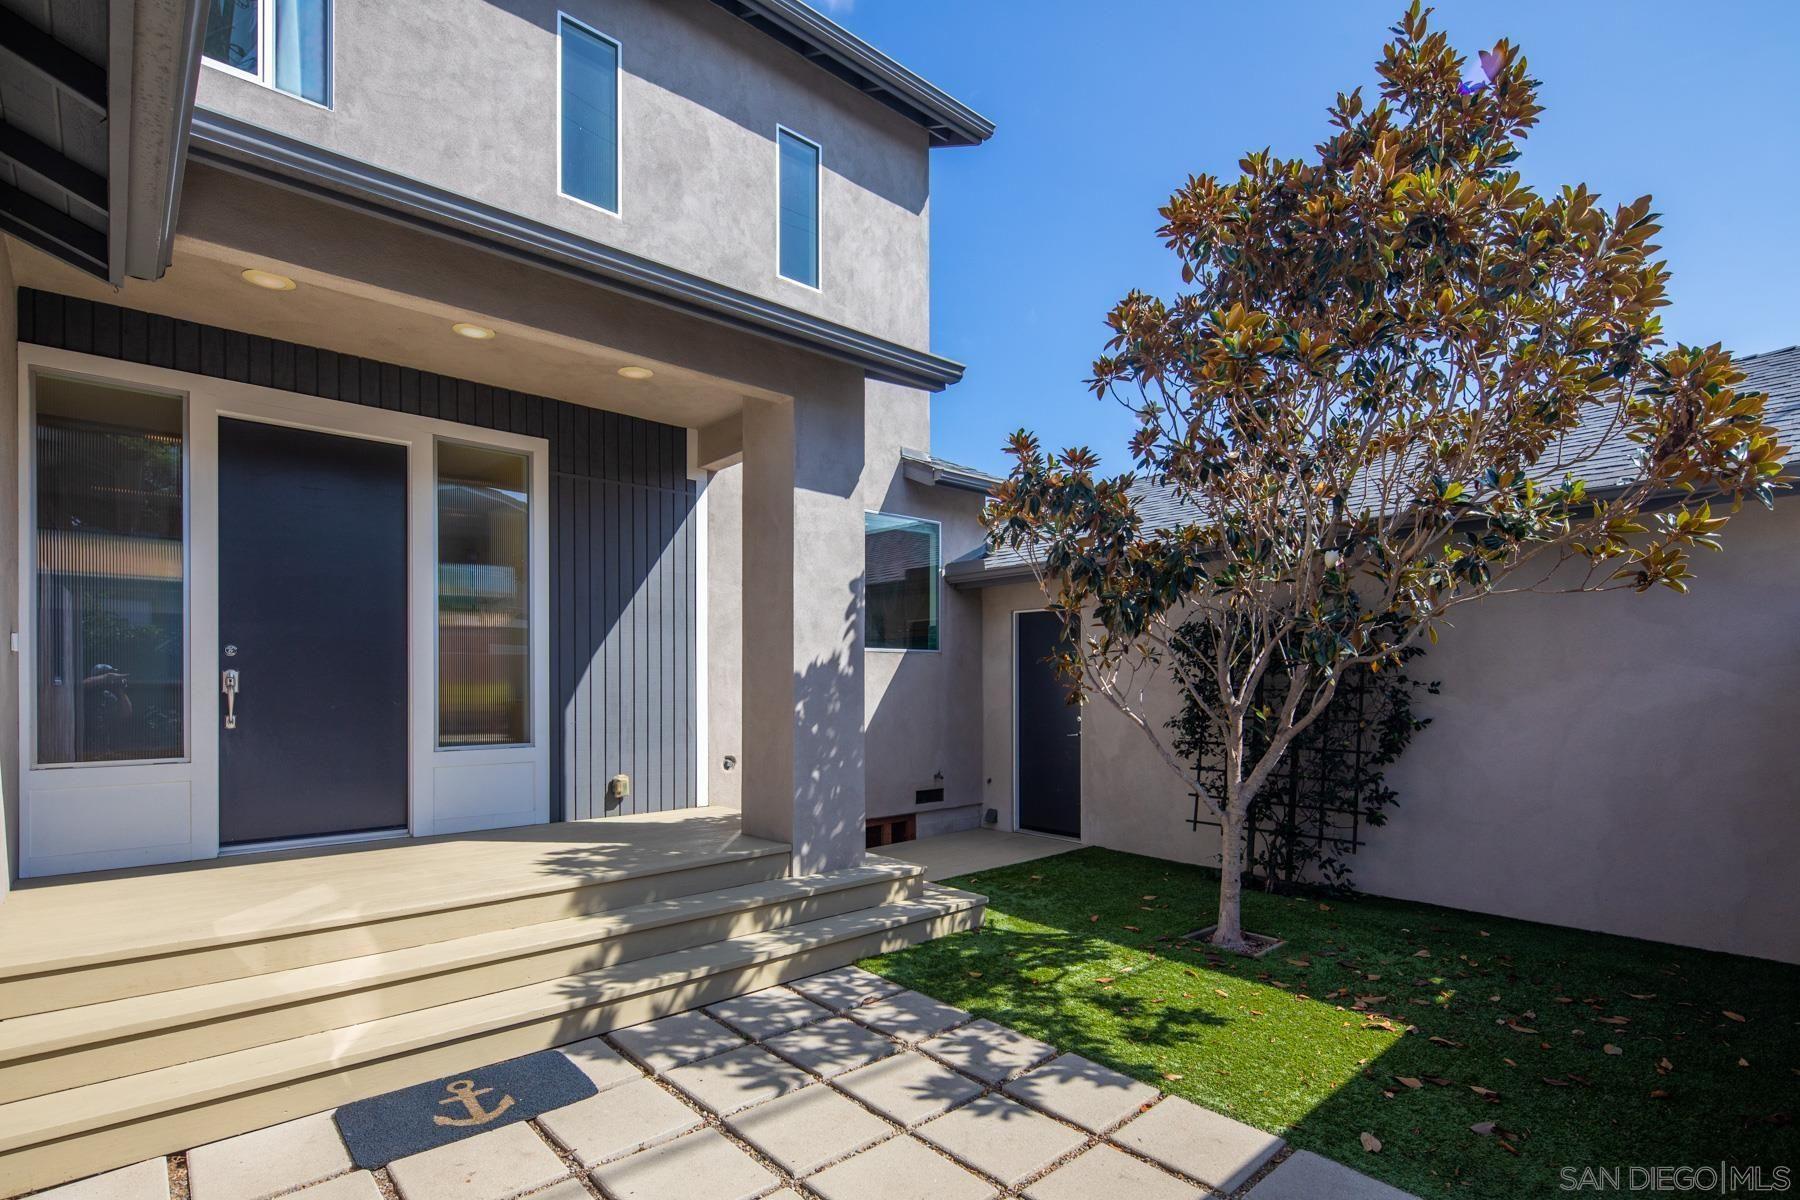 Main Photo: CORONADO VILLAGE House for sale : 5 bedrooms : 405 Adella Lane in Coronado